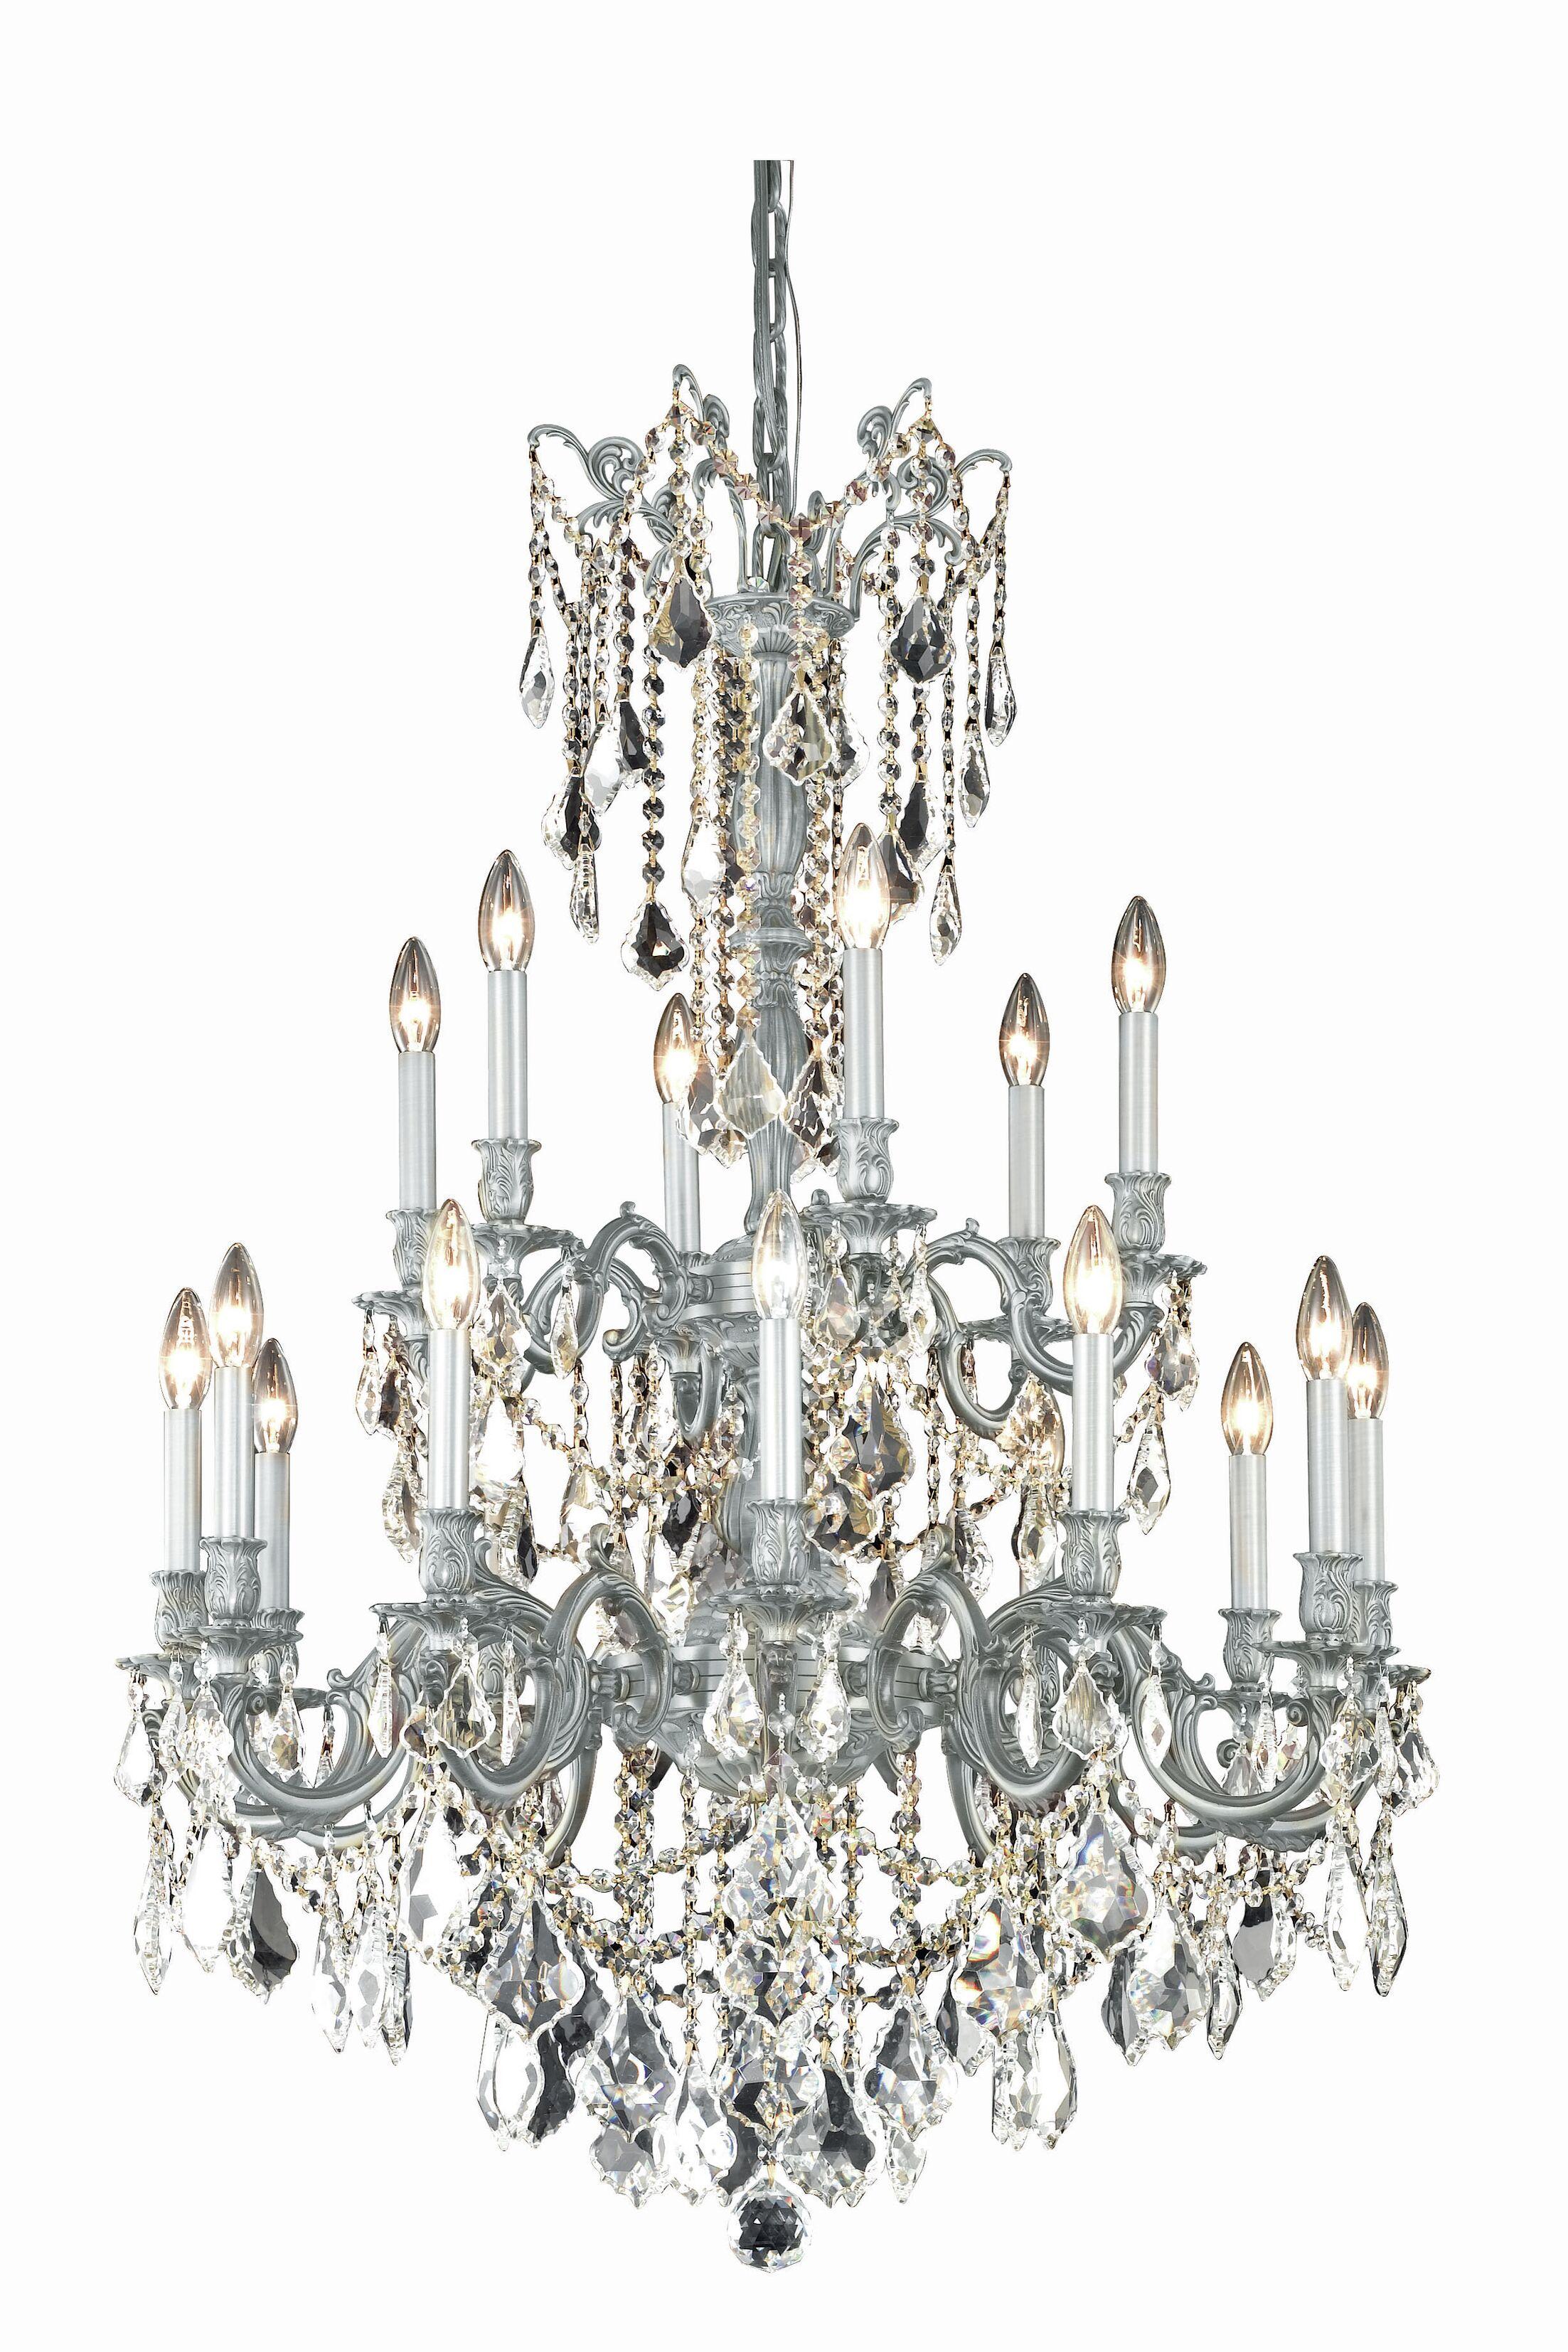 Utica 18-Light Candle Style Chandelier Crystal Grade: Swarovski Element, Color: Pewter